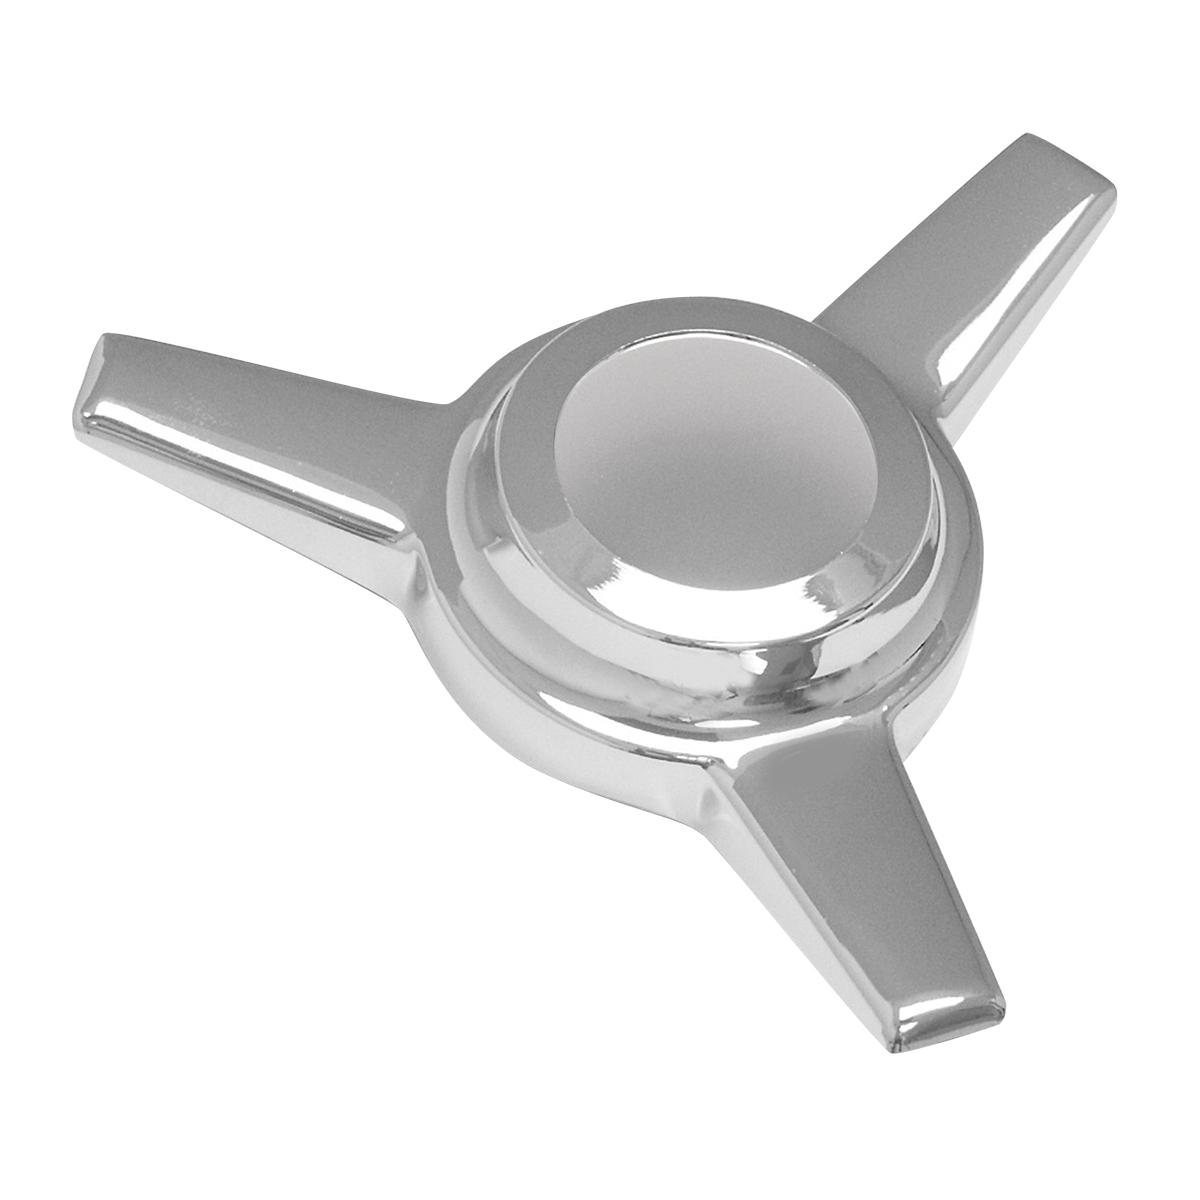 Chrome Die Cast Knock – Off Spinner 3 Bar – Straight